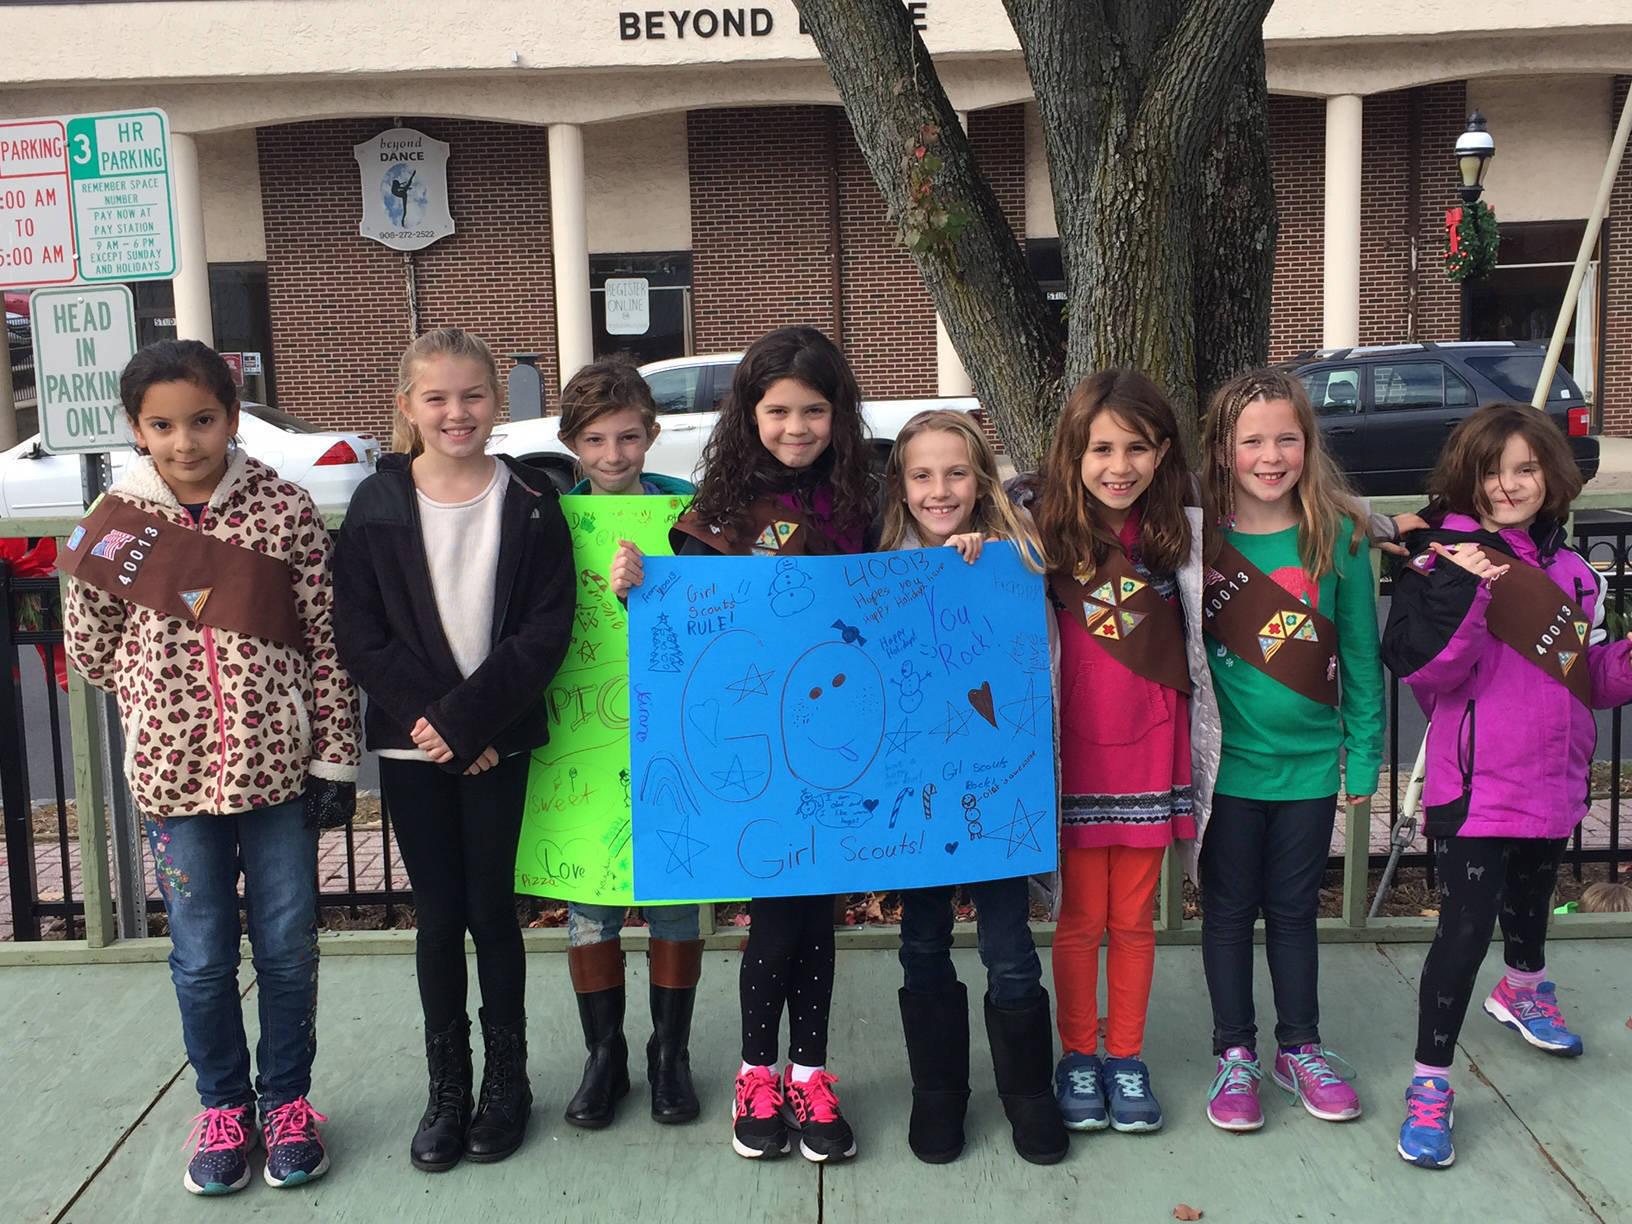 Girl Scouts of Cranford Kick Off Holiday Season